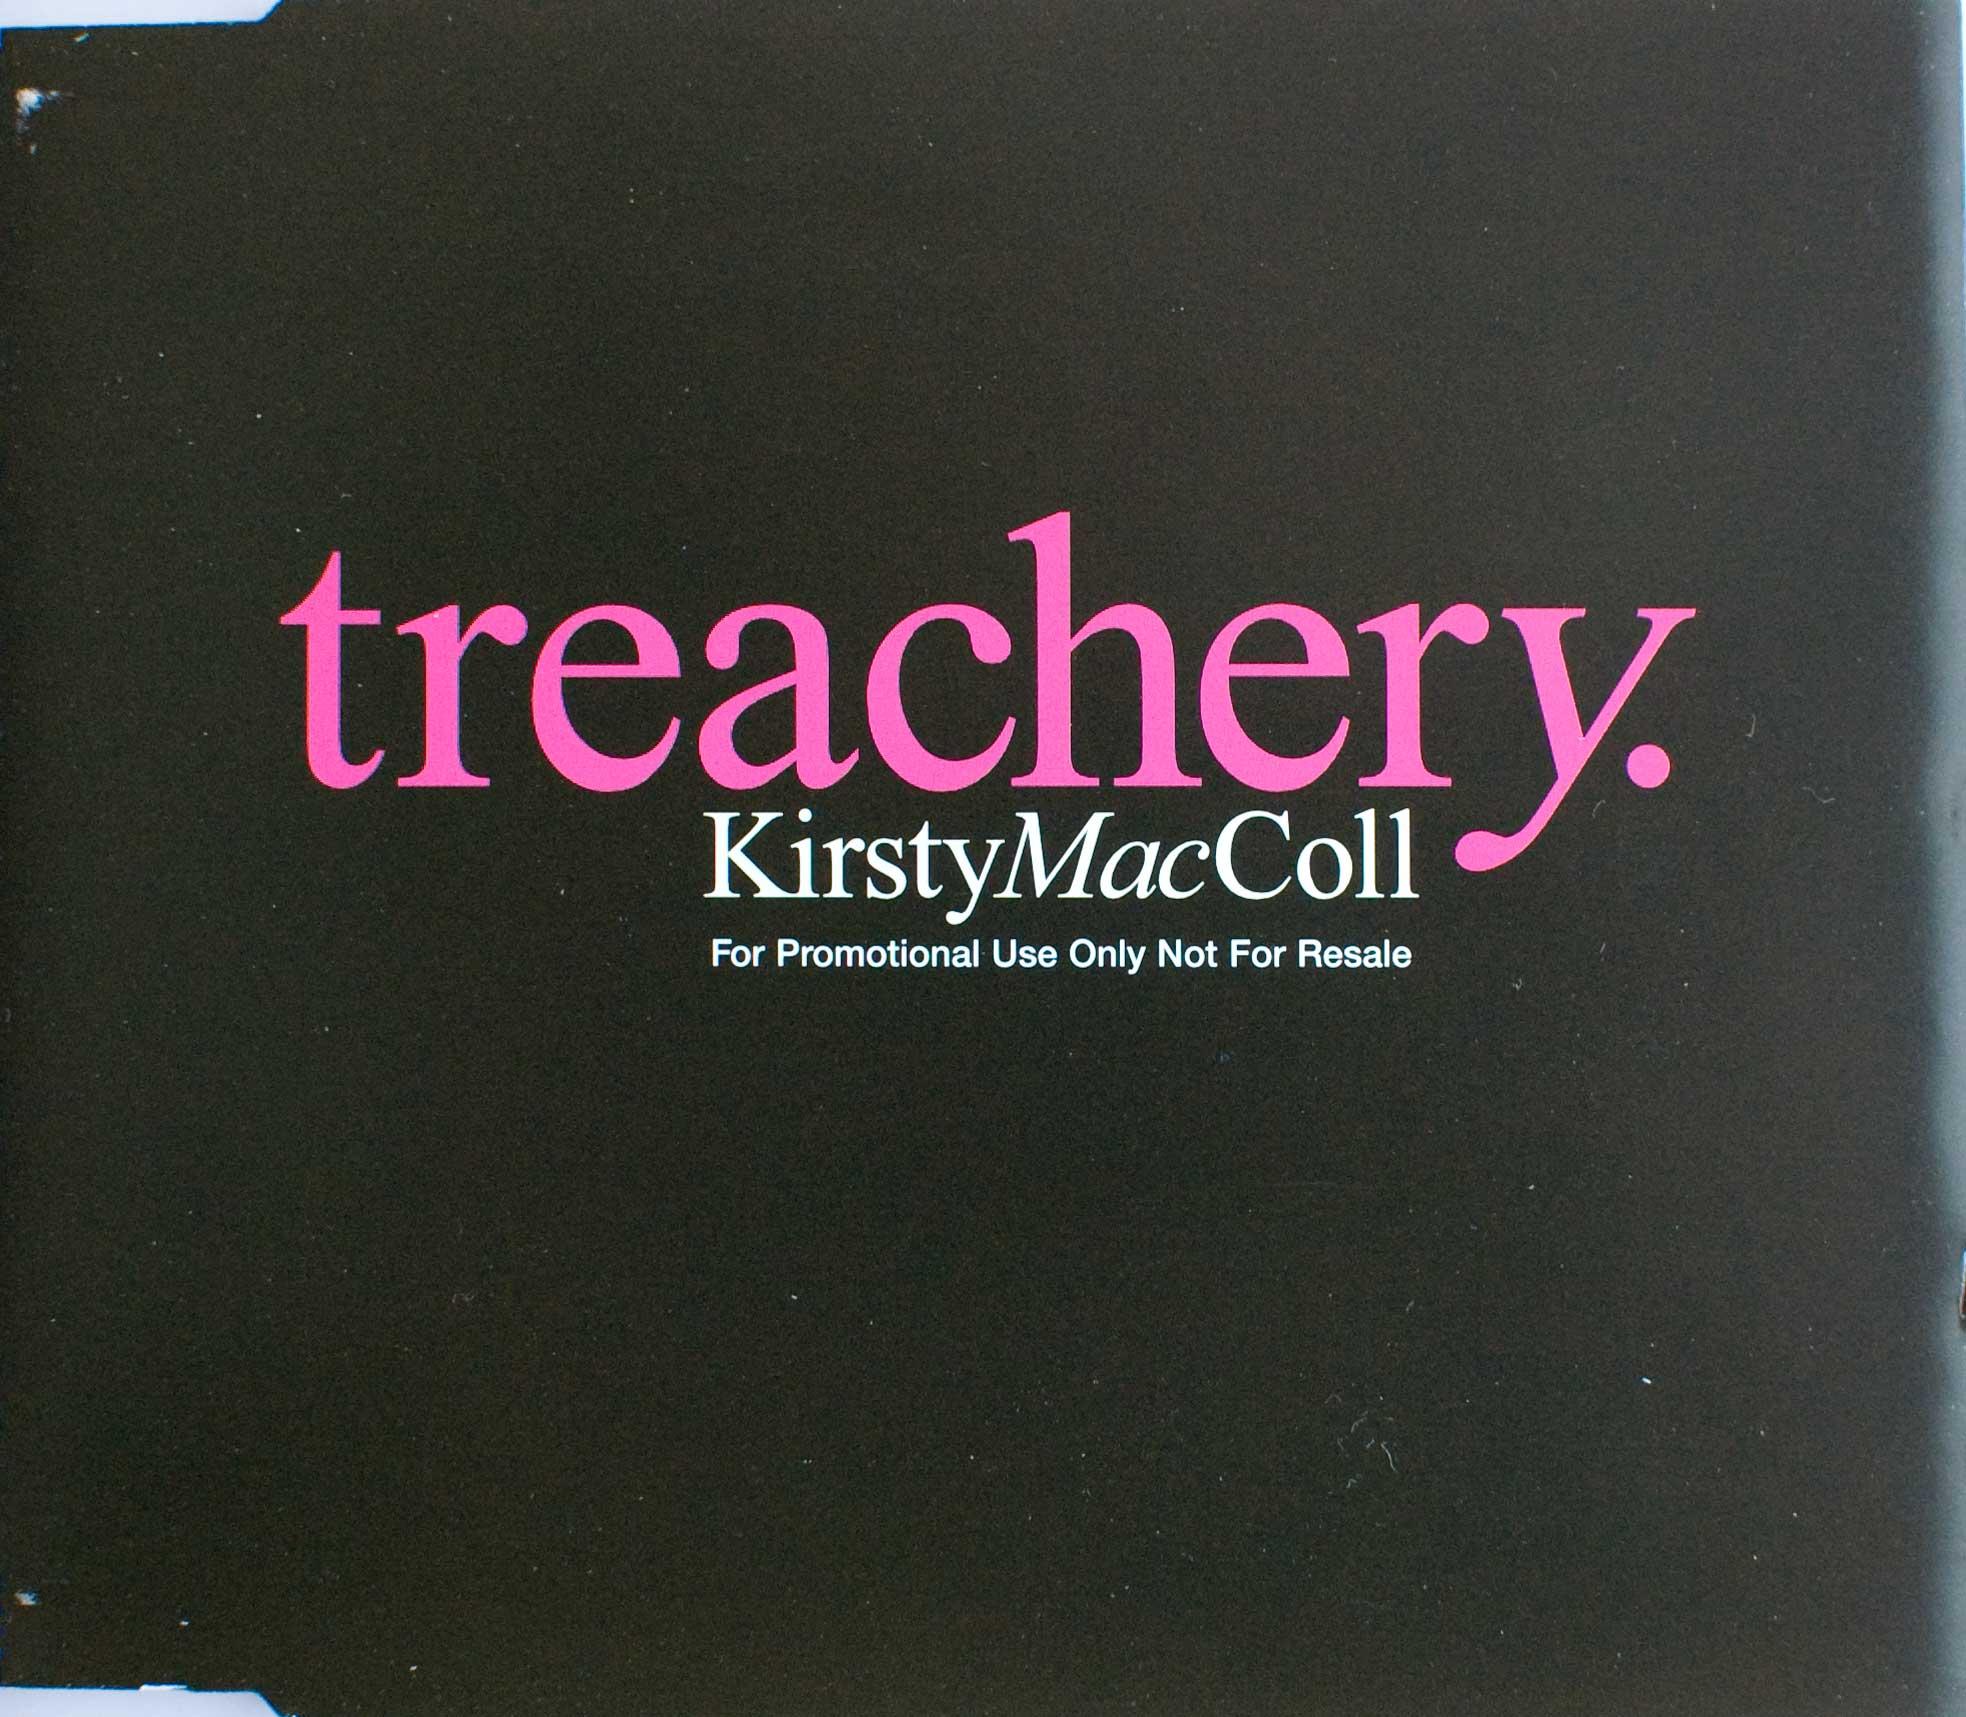 Treachery (CD promo) front cover